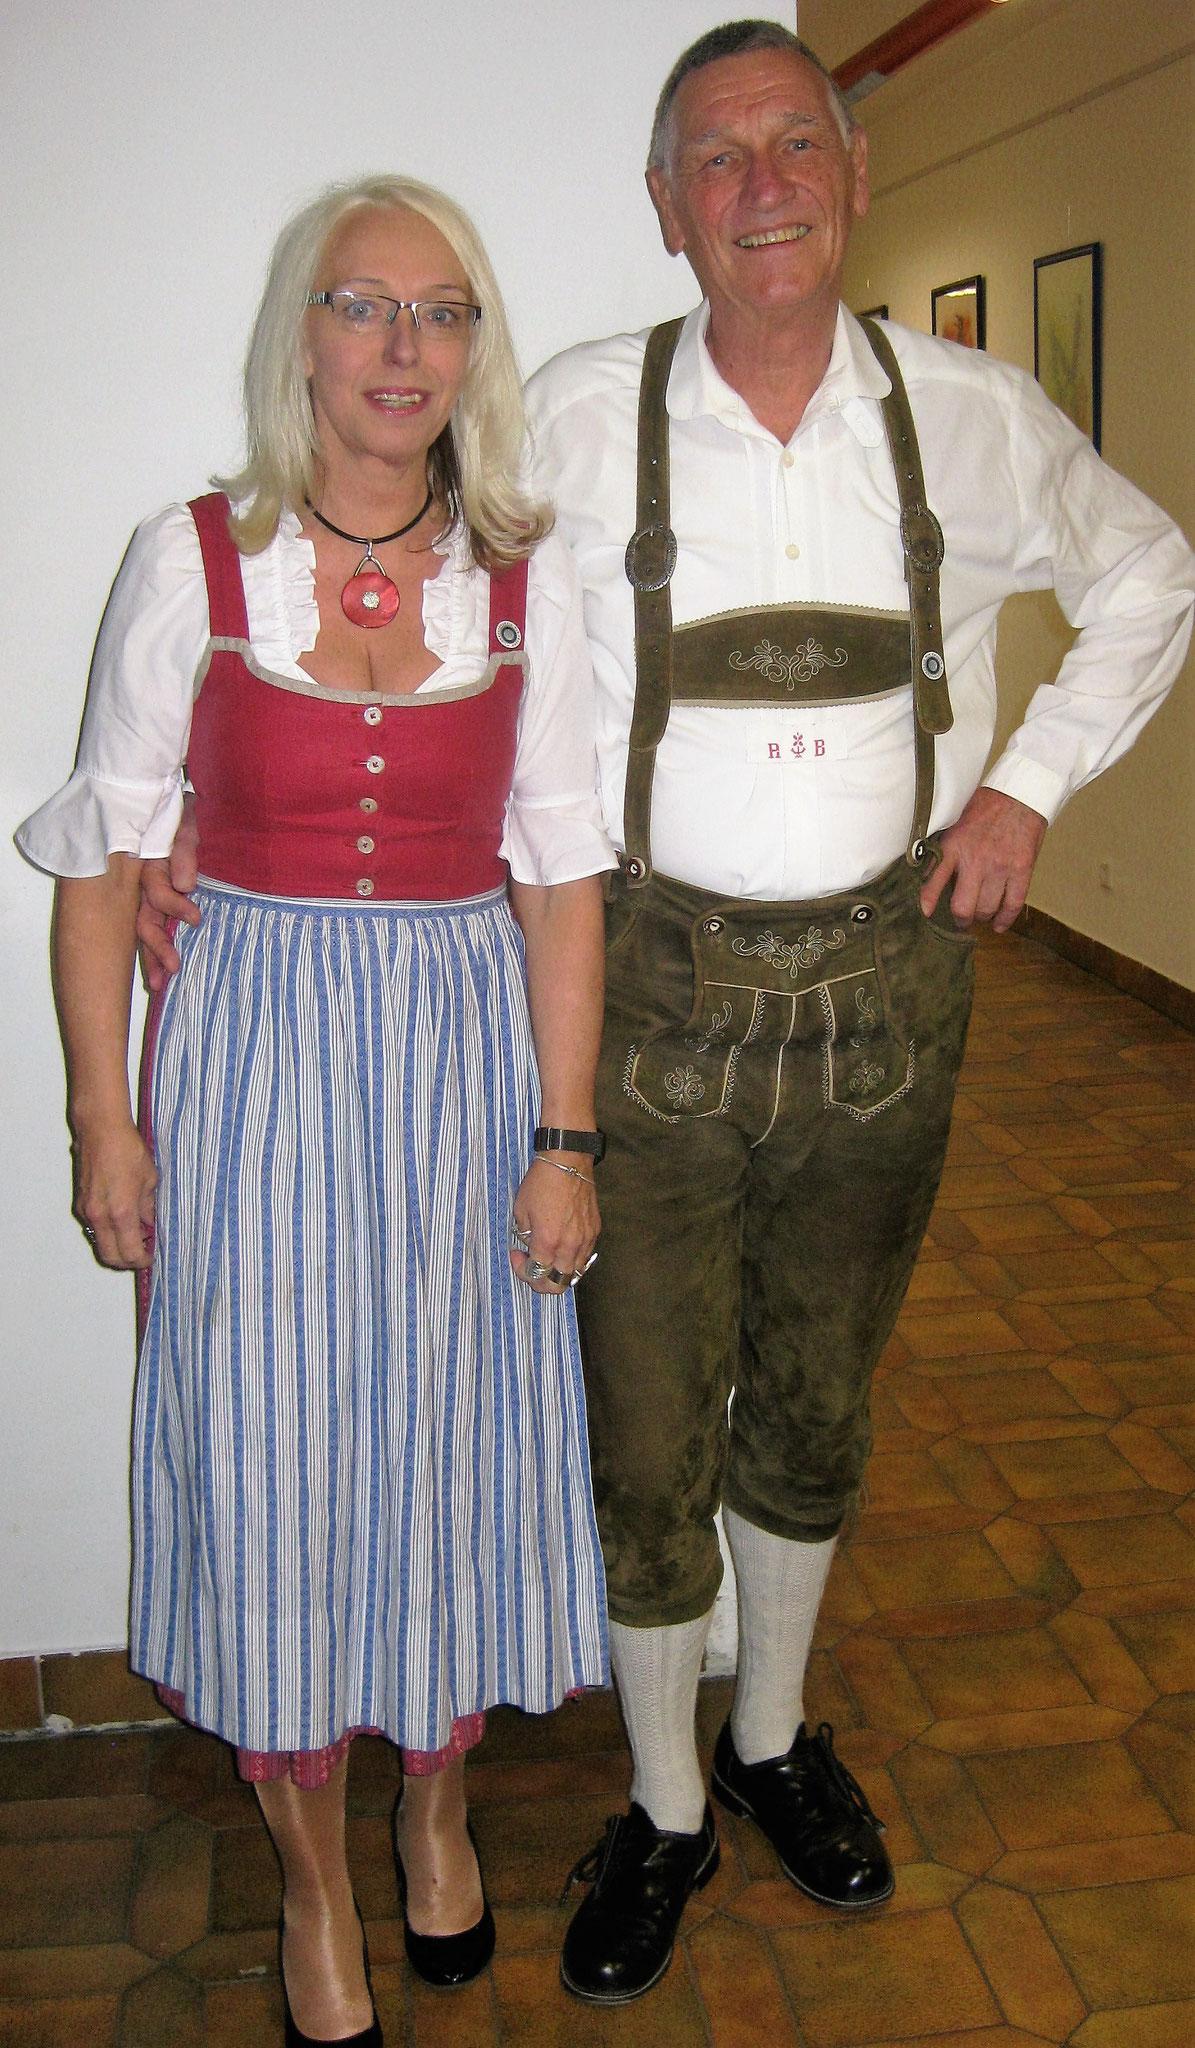 Heidi und Rudi